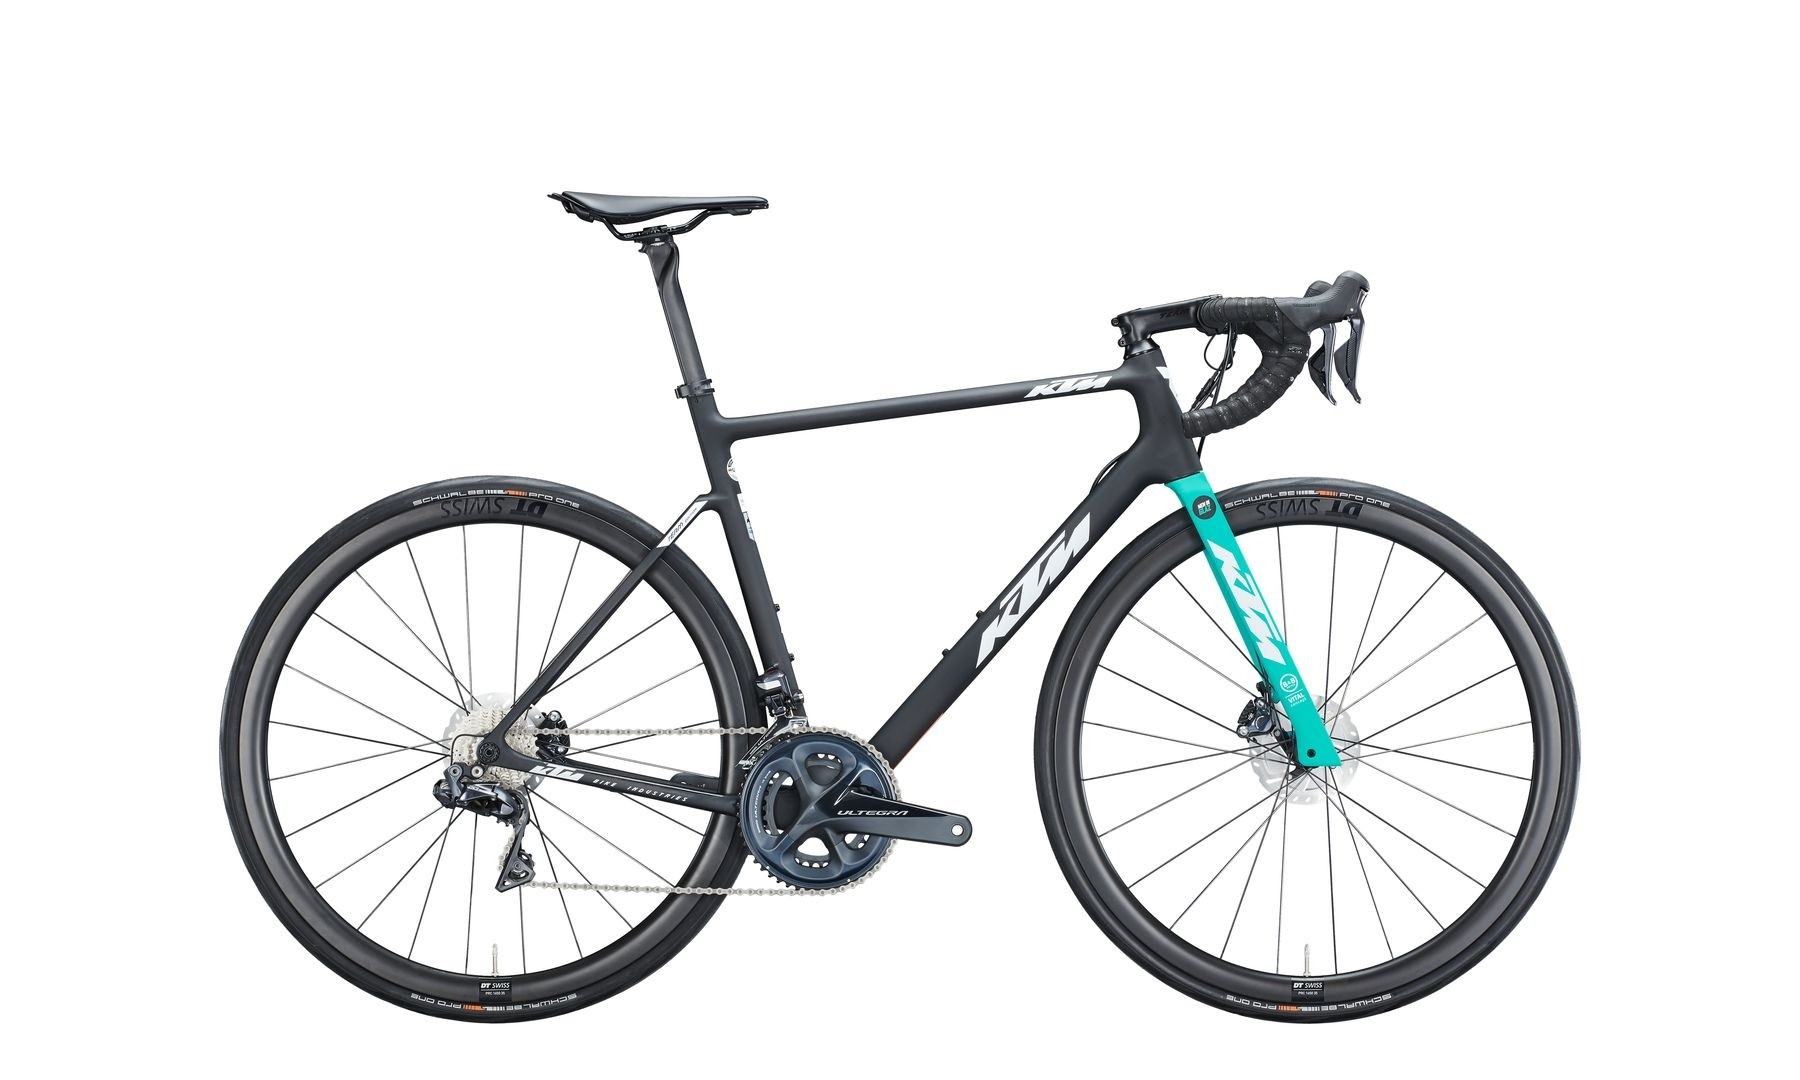 Vélo route Ktm Revelator Lisse Prestige 2018 - Veloclic.com, spécialiste KTM - Veloclic